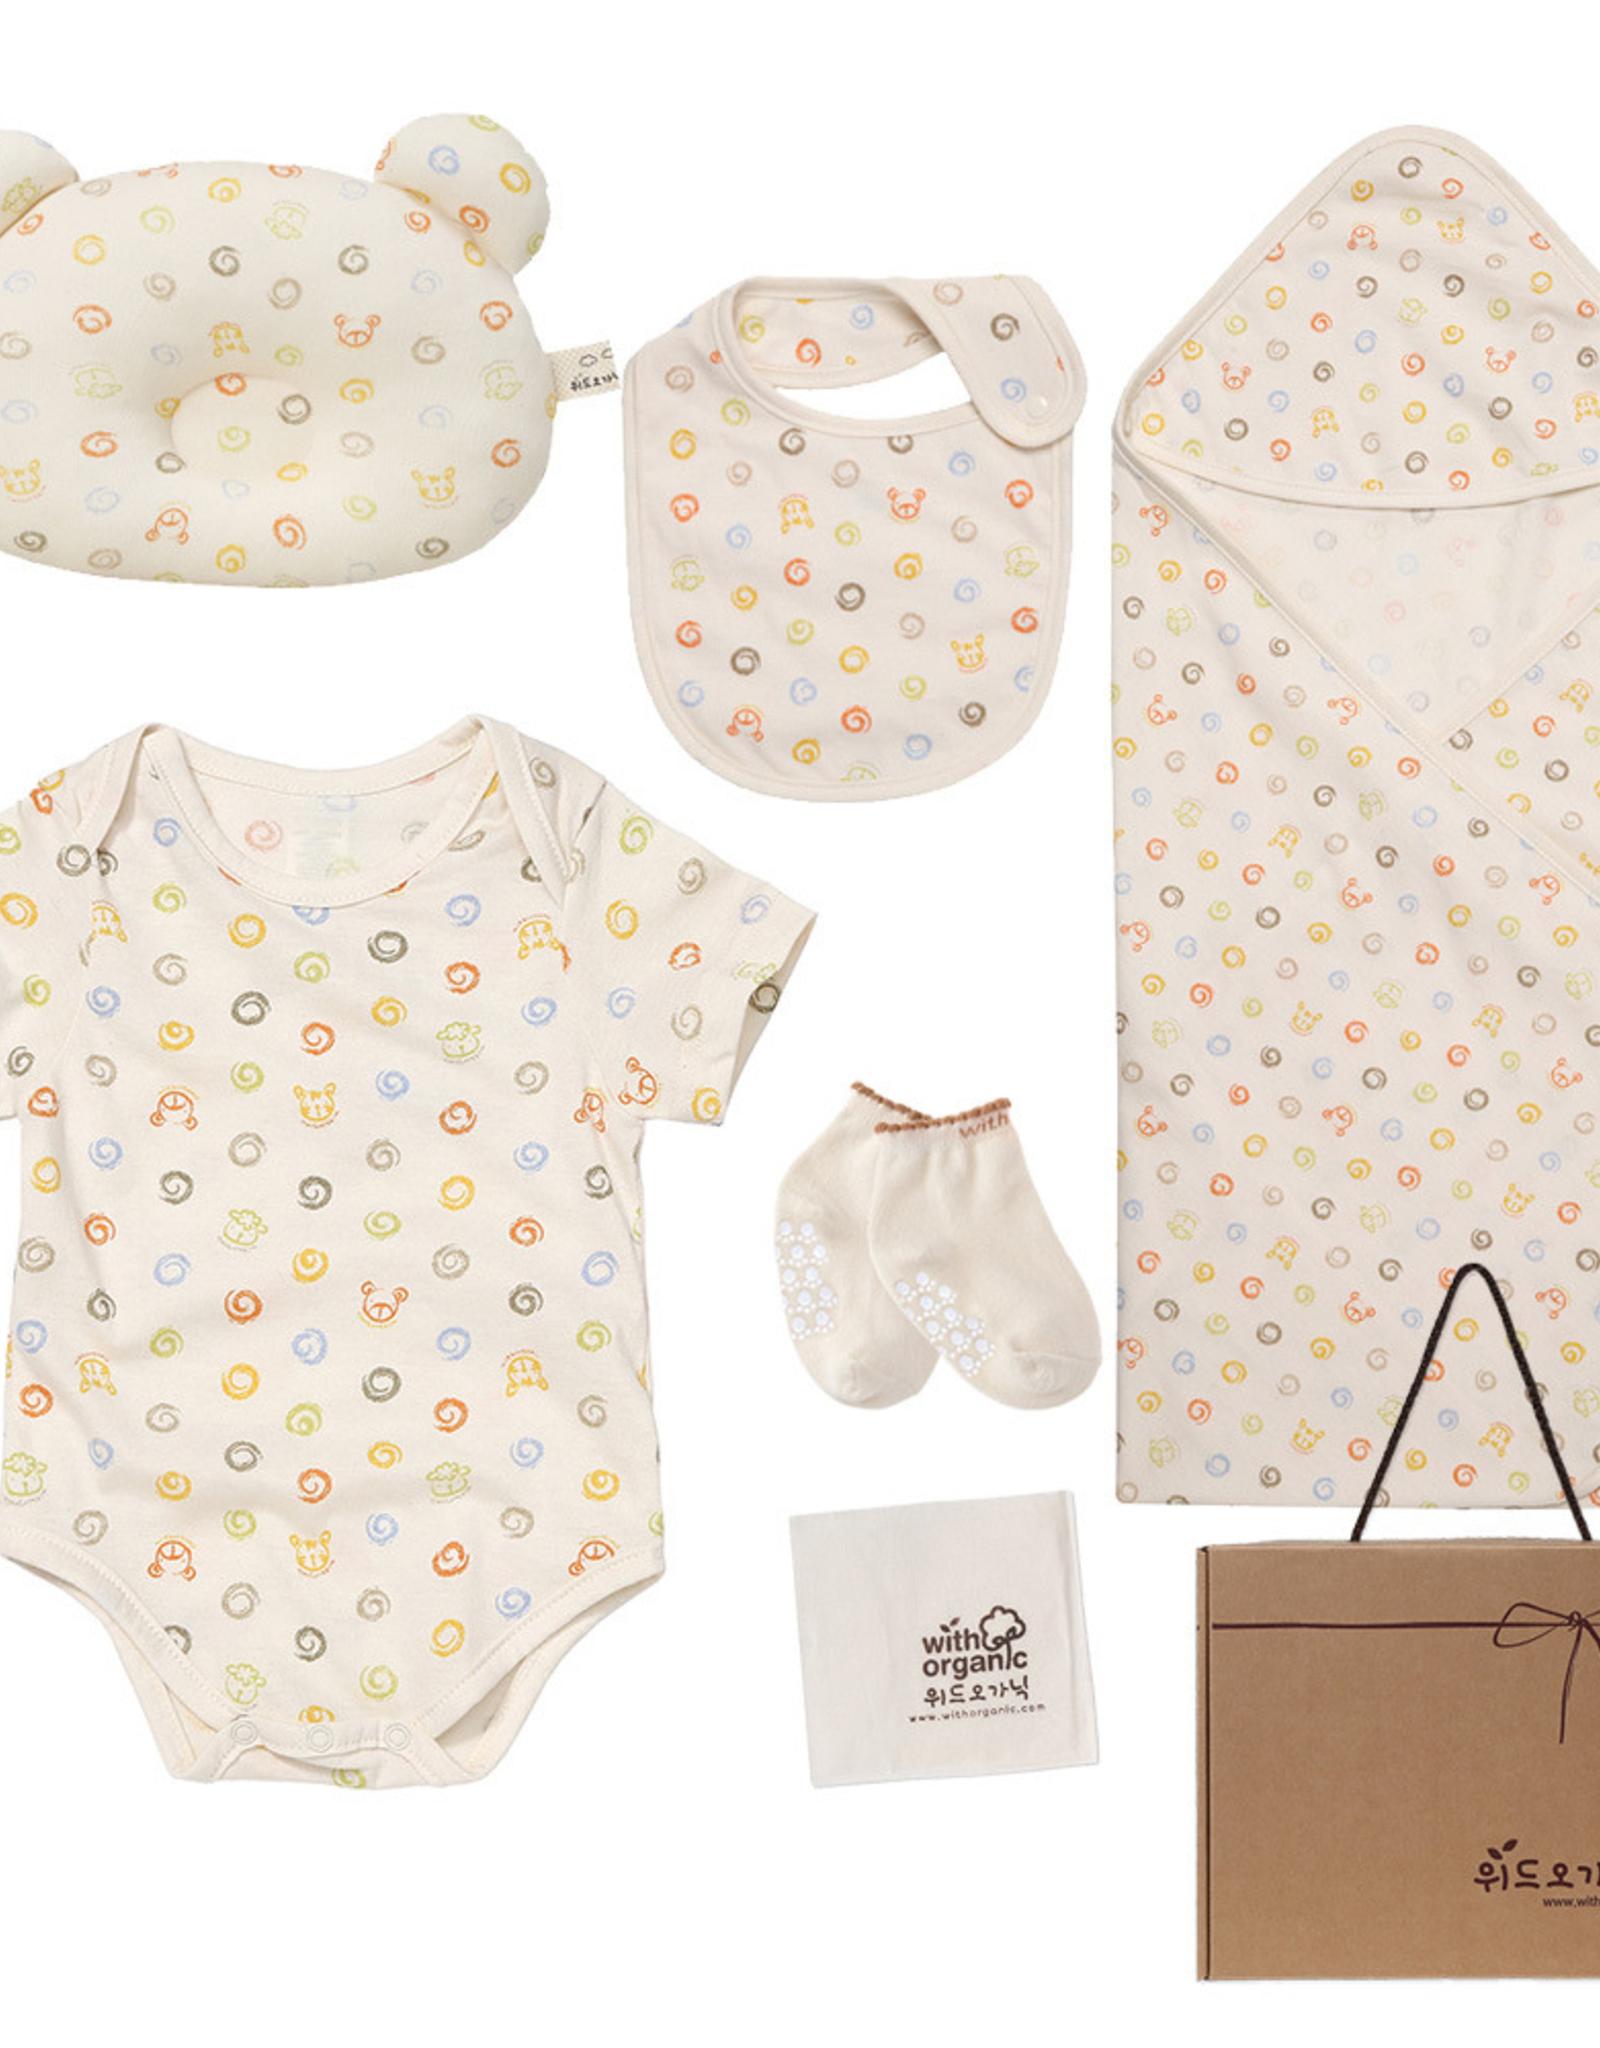 WithOrganic Organic Baby 7 Piece Gift Set